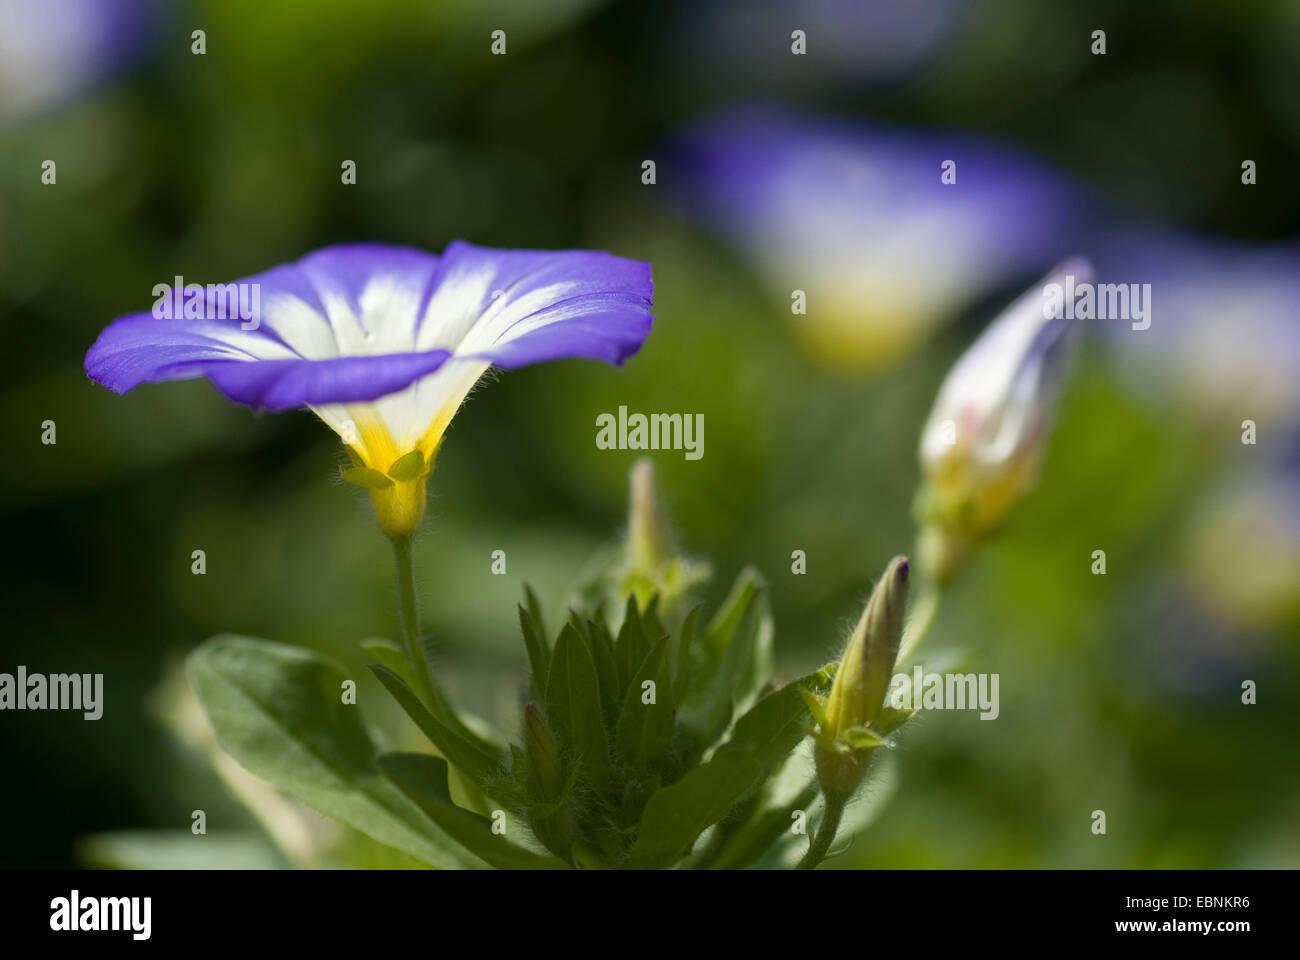 Dwarf convolvulus, Dwarf Morning Glory (Convolvulus tricolor), flowers - Stock Image